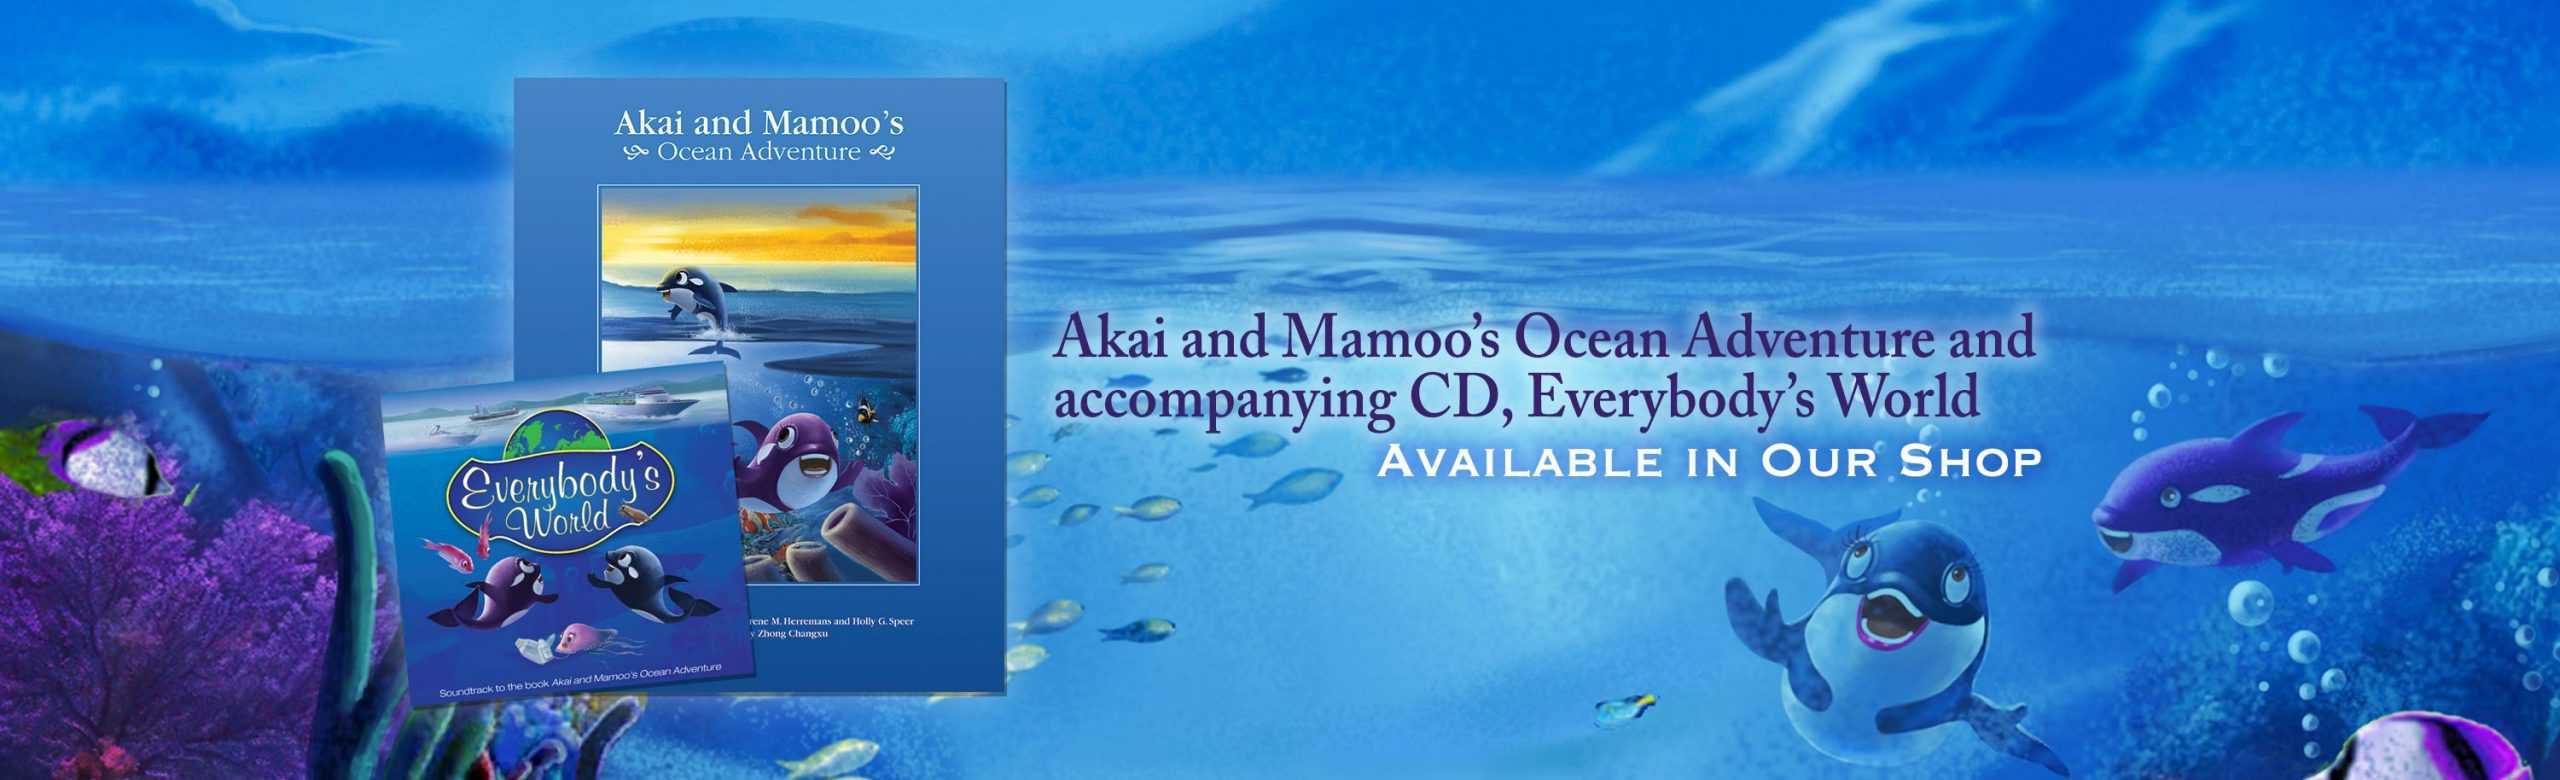 Akai and Mamoo-Book and CD available at Nature's Ride